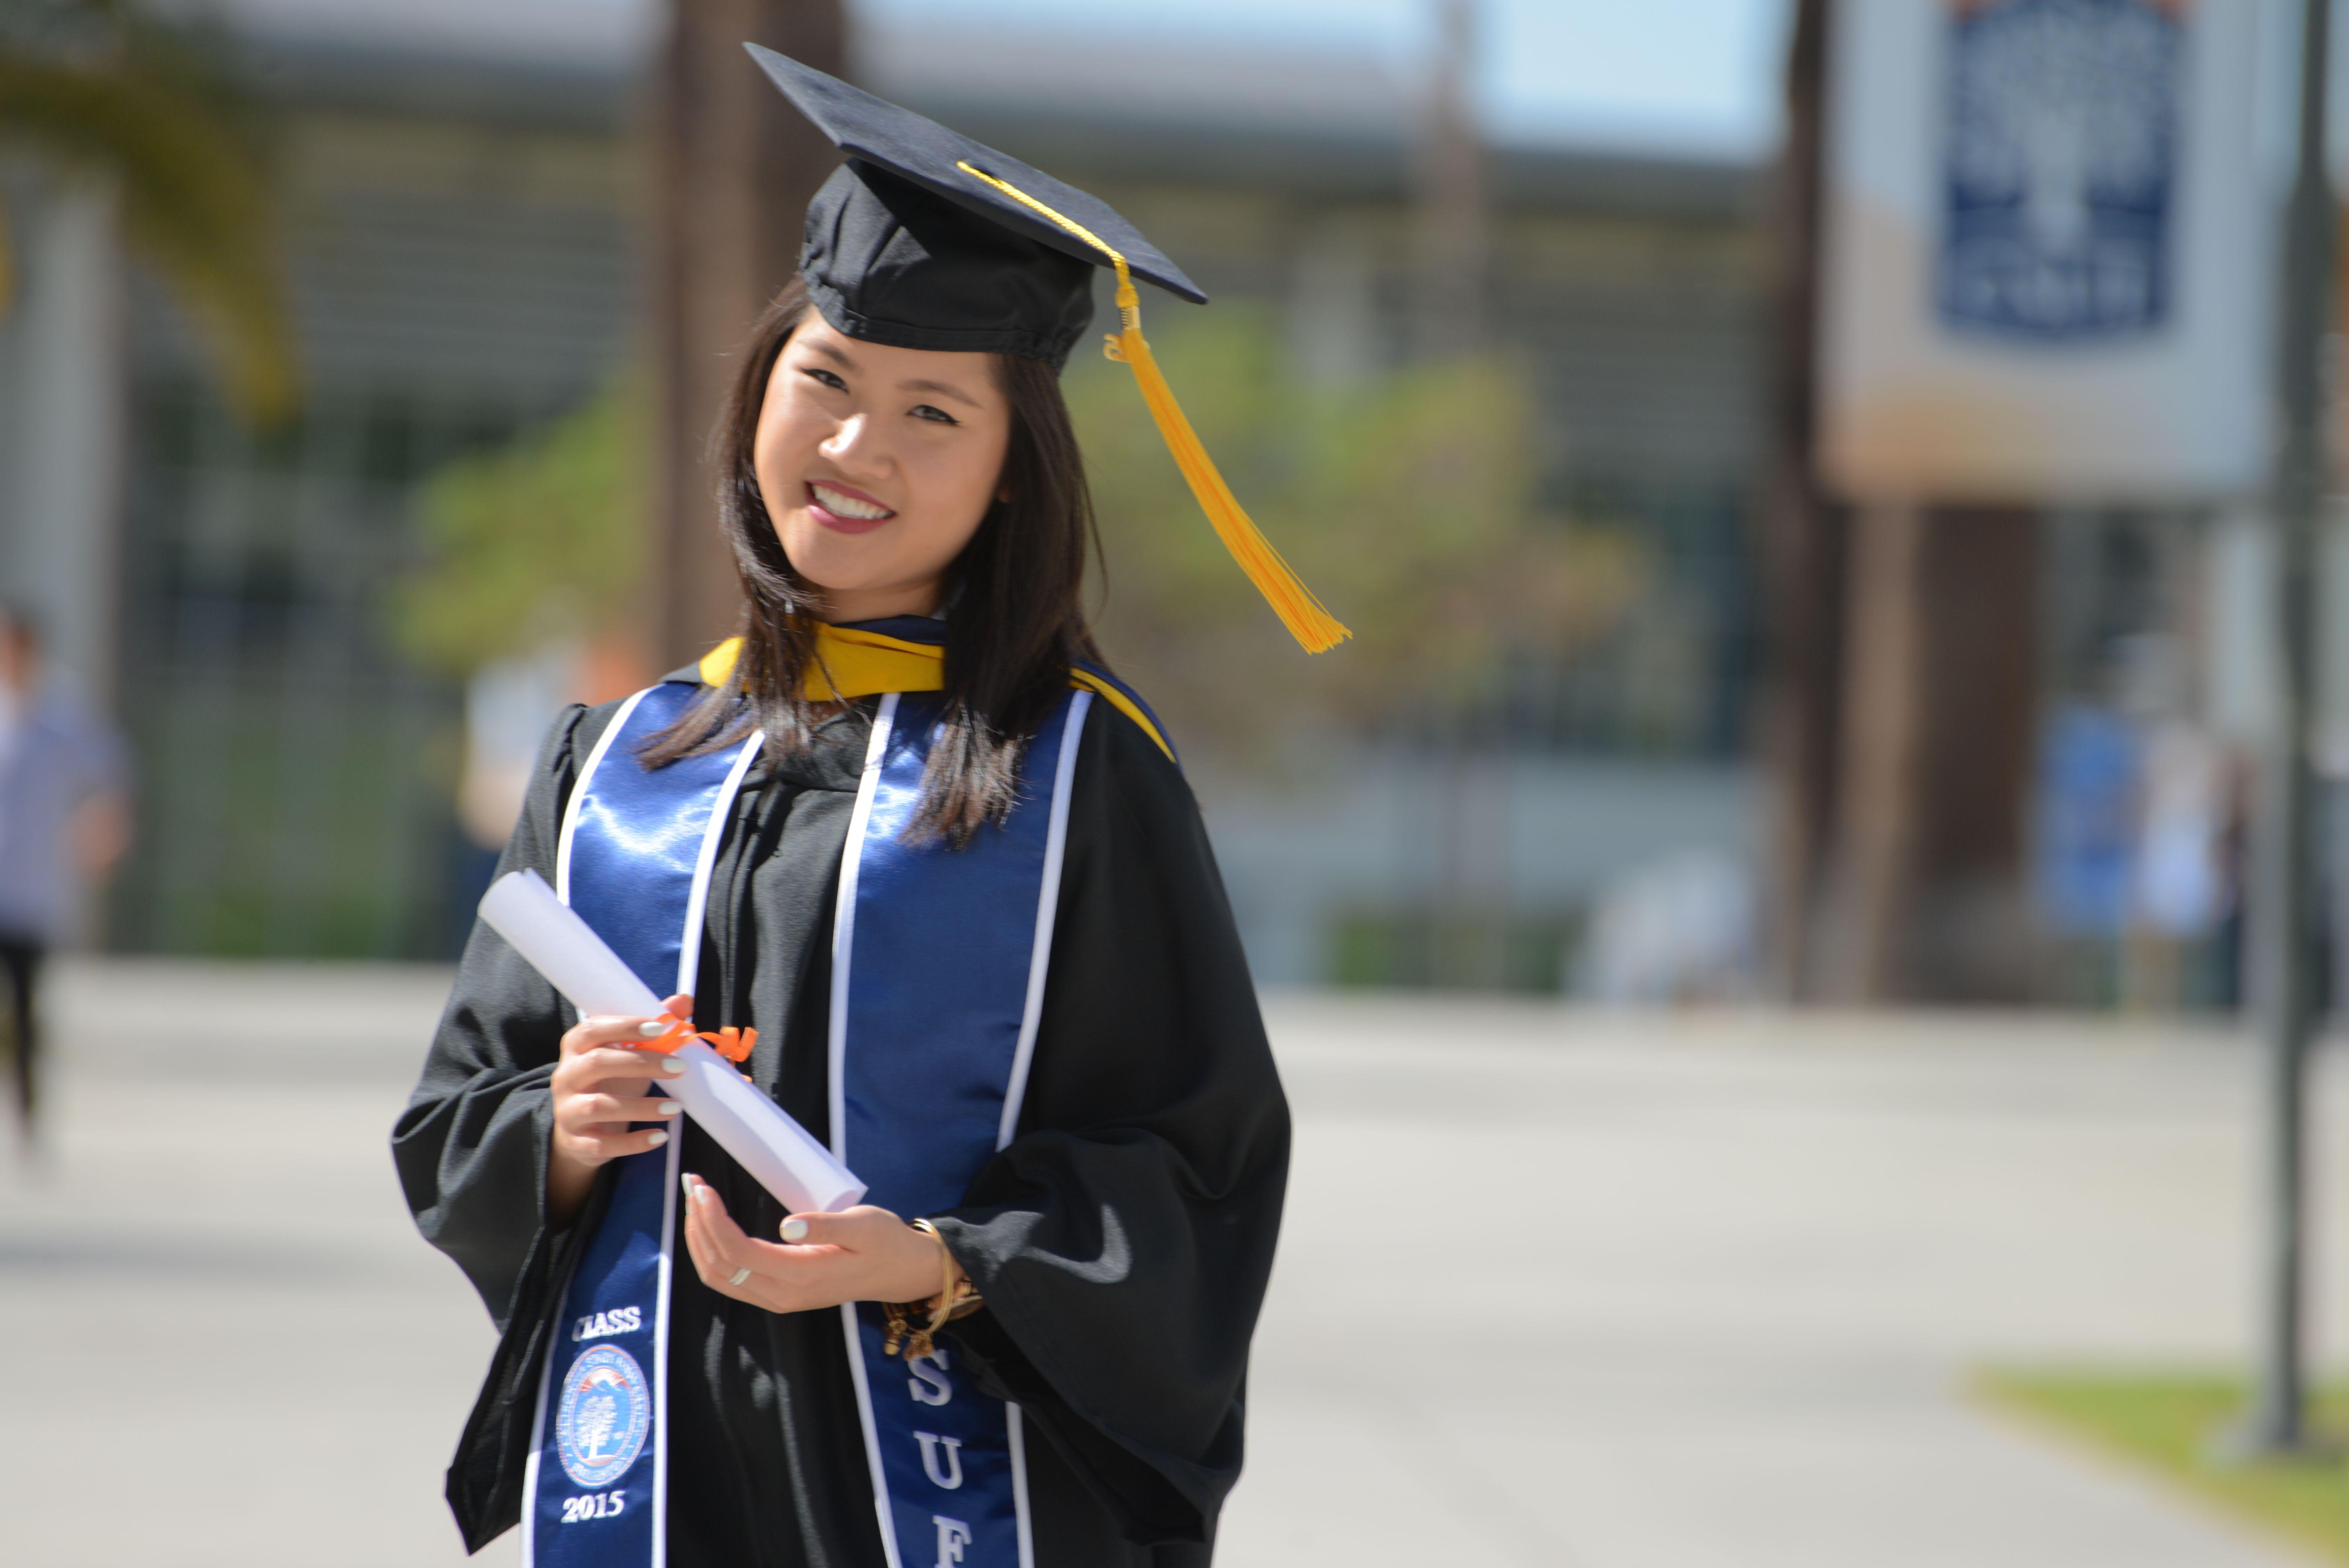 Csuf Graduation Csuf2015 Titanshops Graduation Hat